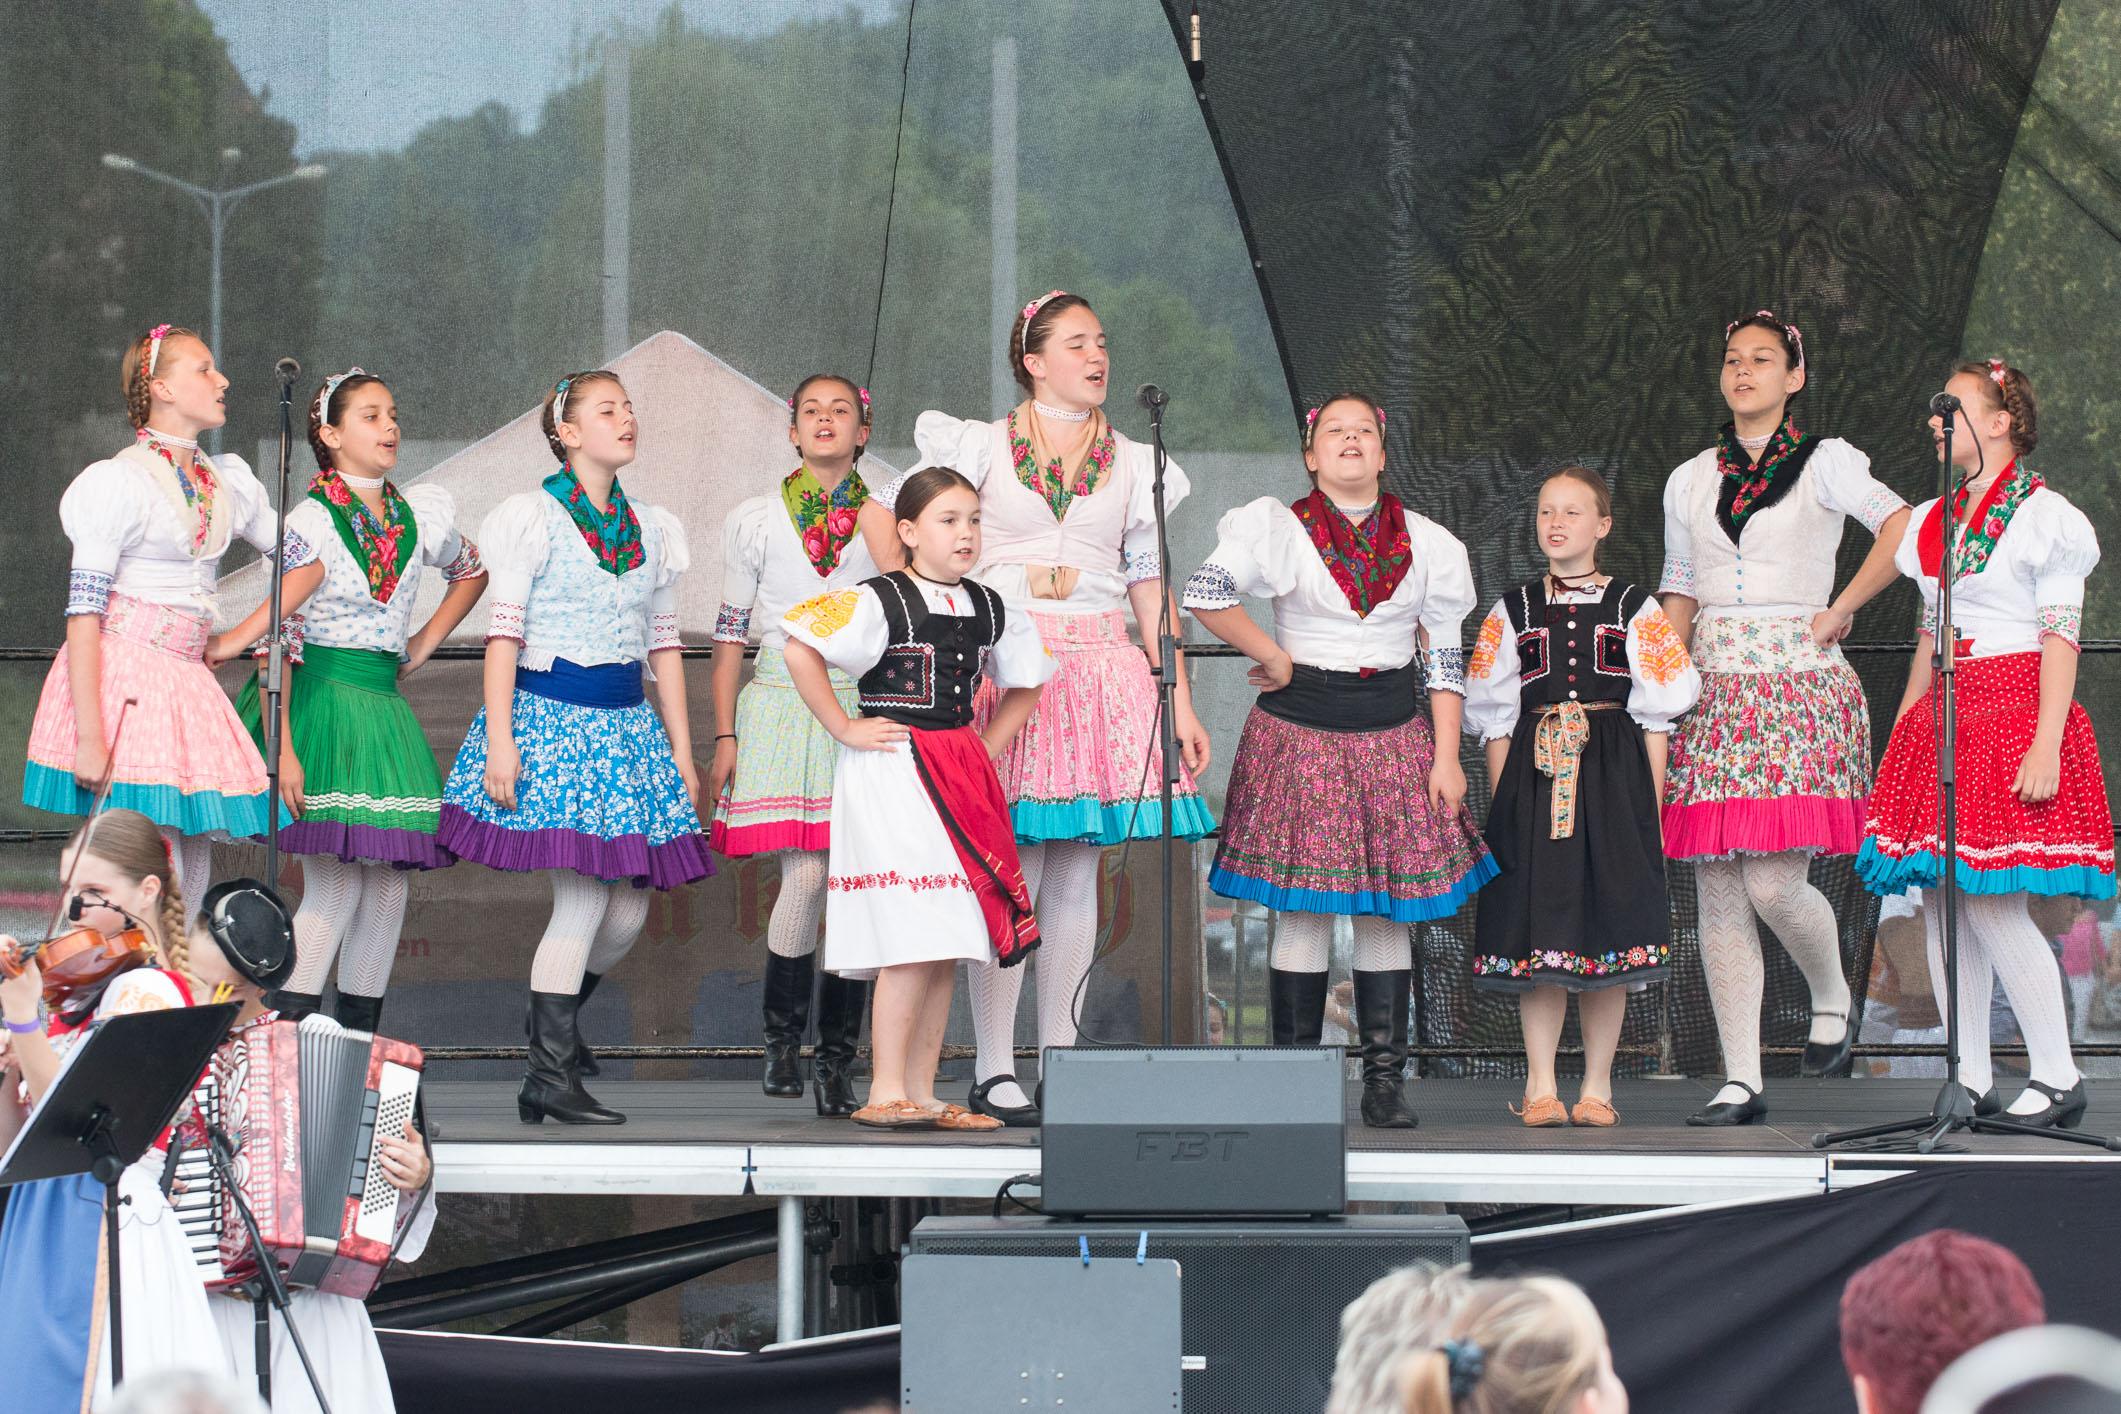 folklor-korzo-2016-zvolen-13